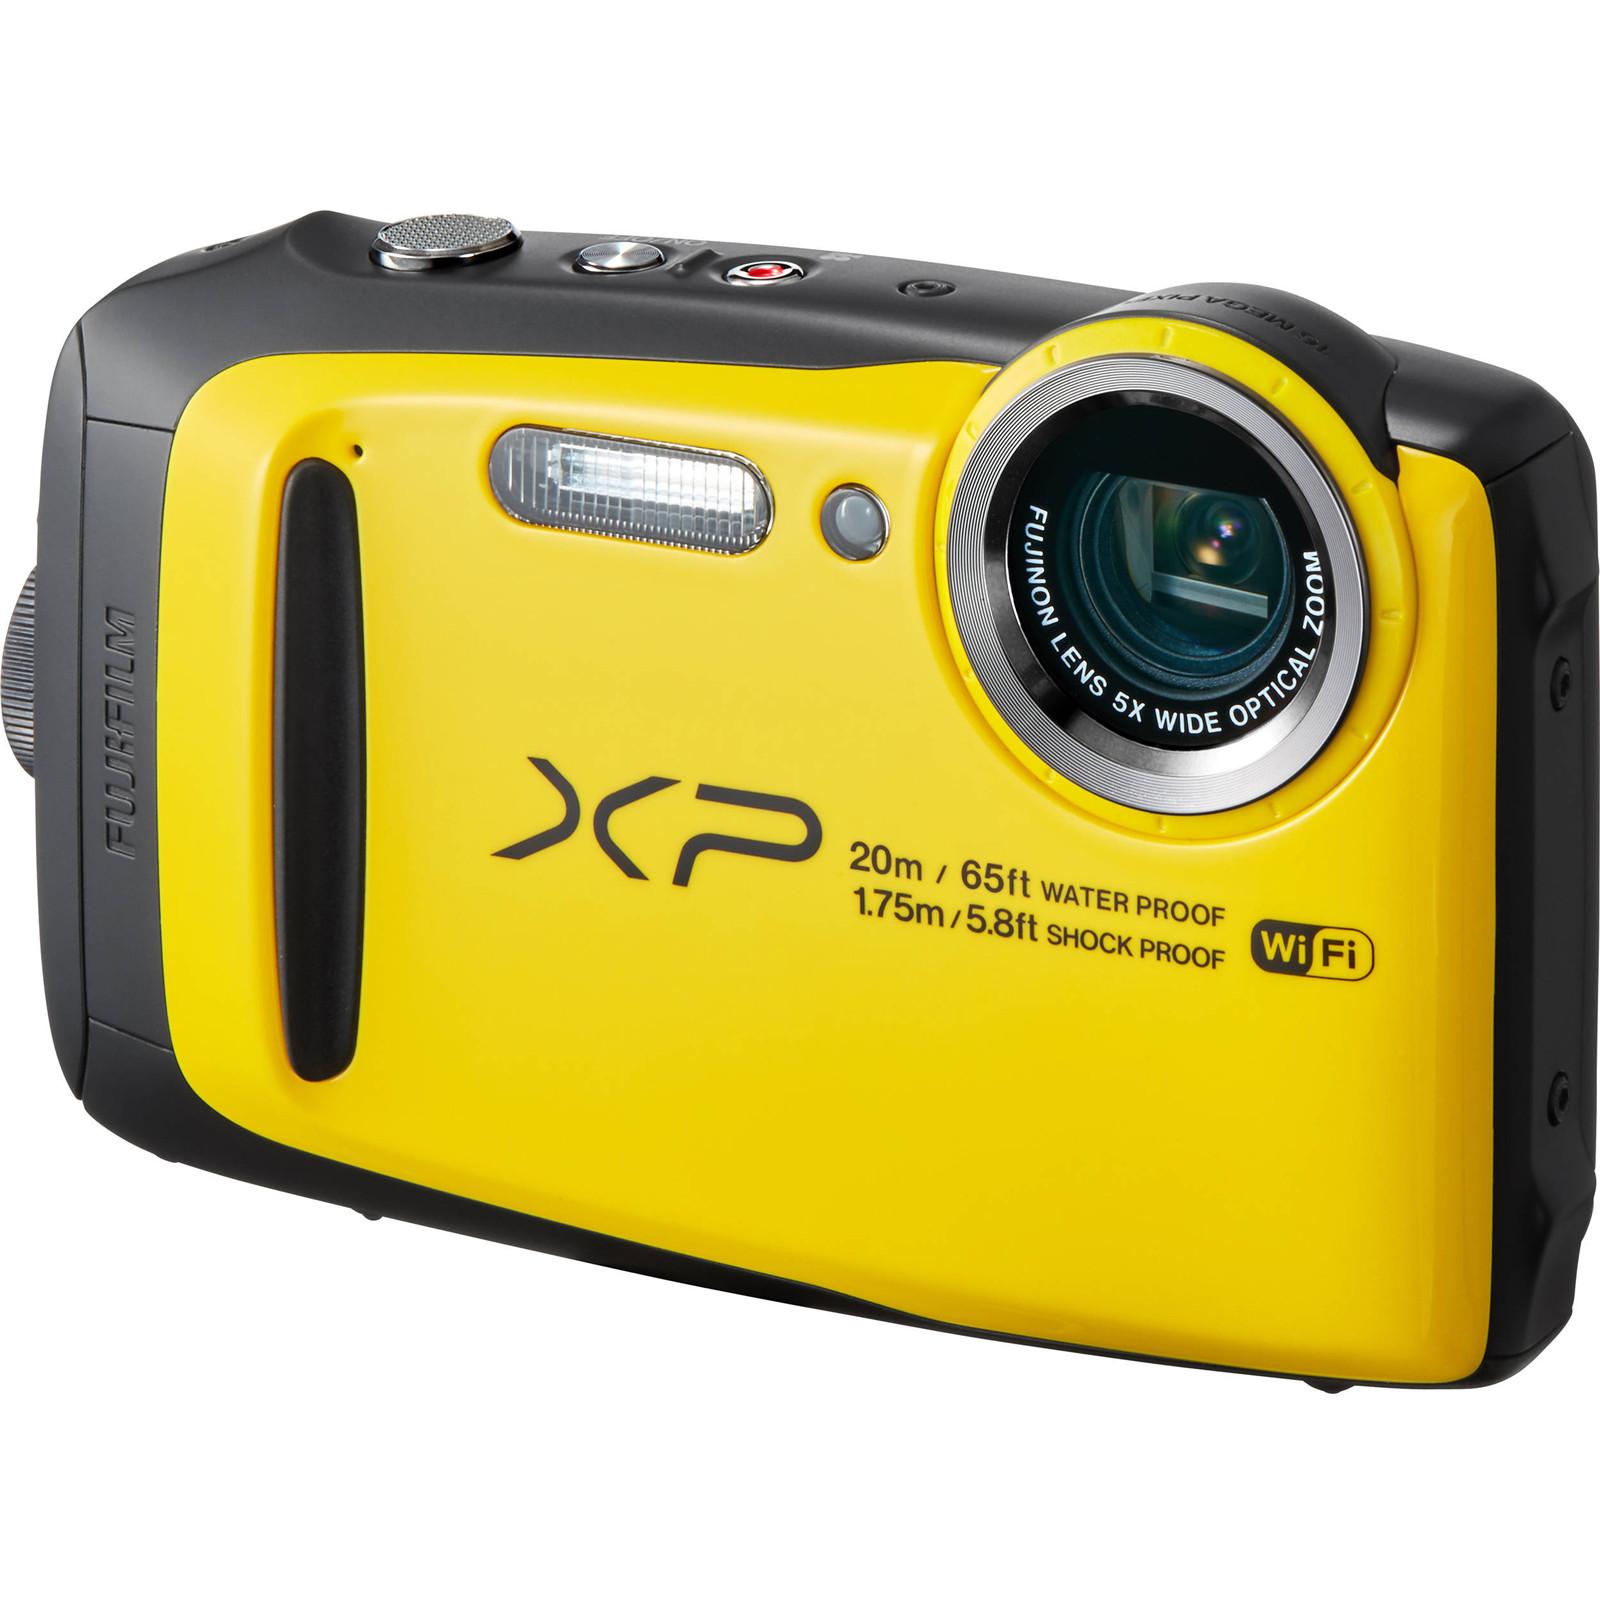 FujiFilm FinePix XP120 Digital Camera 164MP BSI CMOS Sensor Fujinon 5x Optical Zoom Lens Water Shock Freeze And Dustproof Yellow